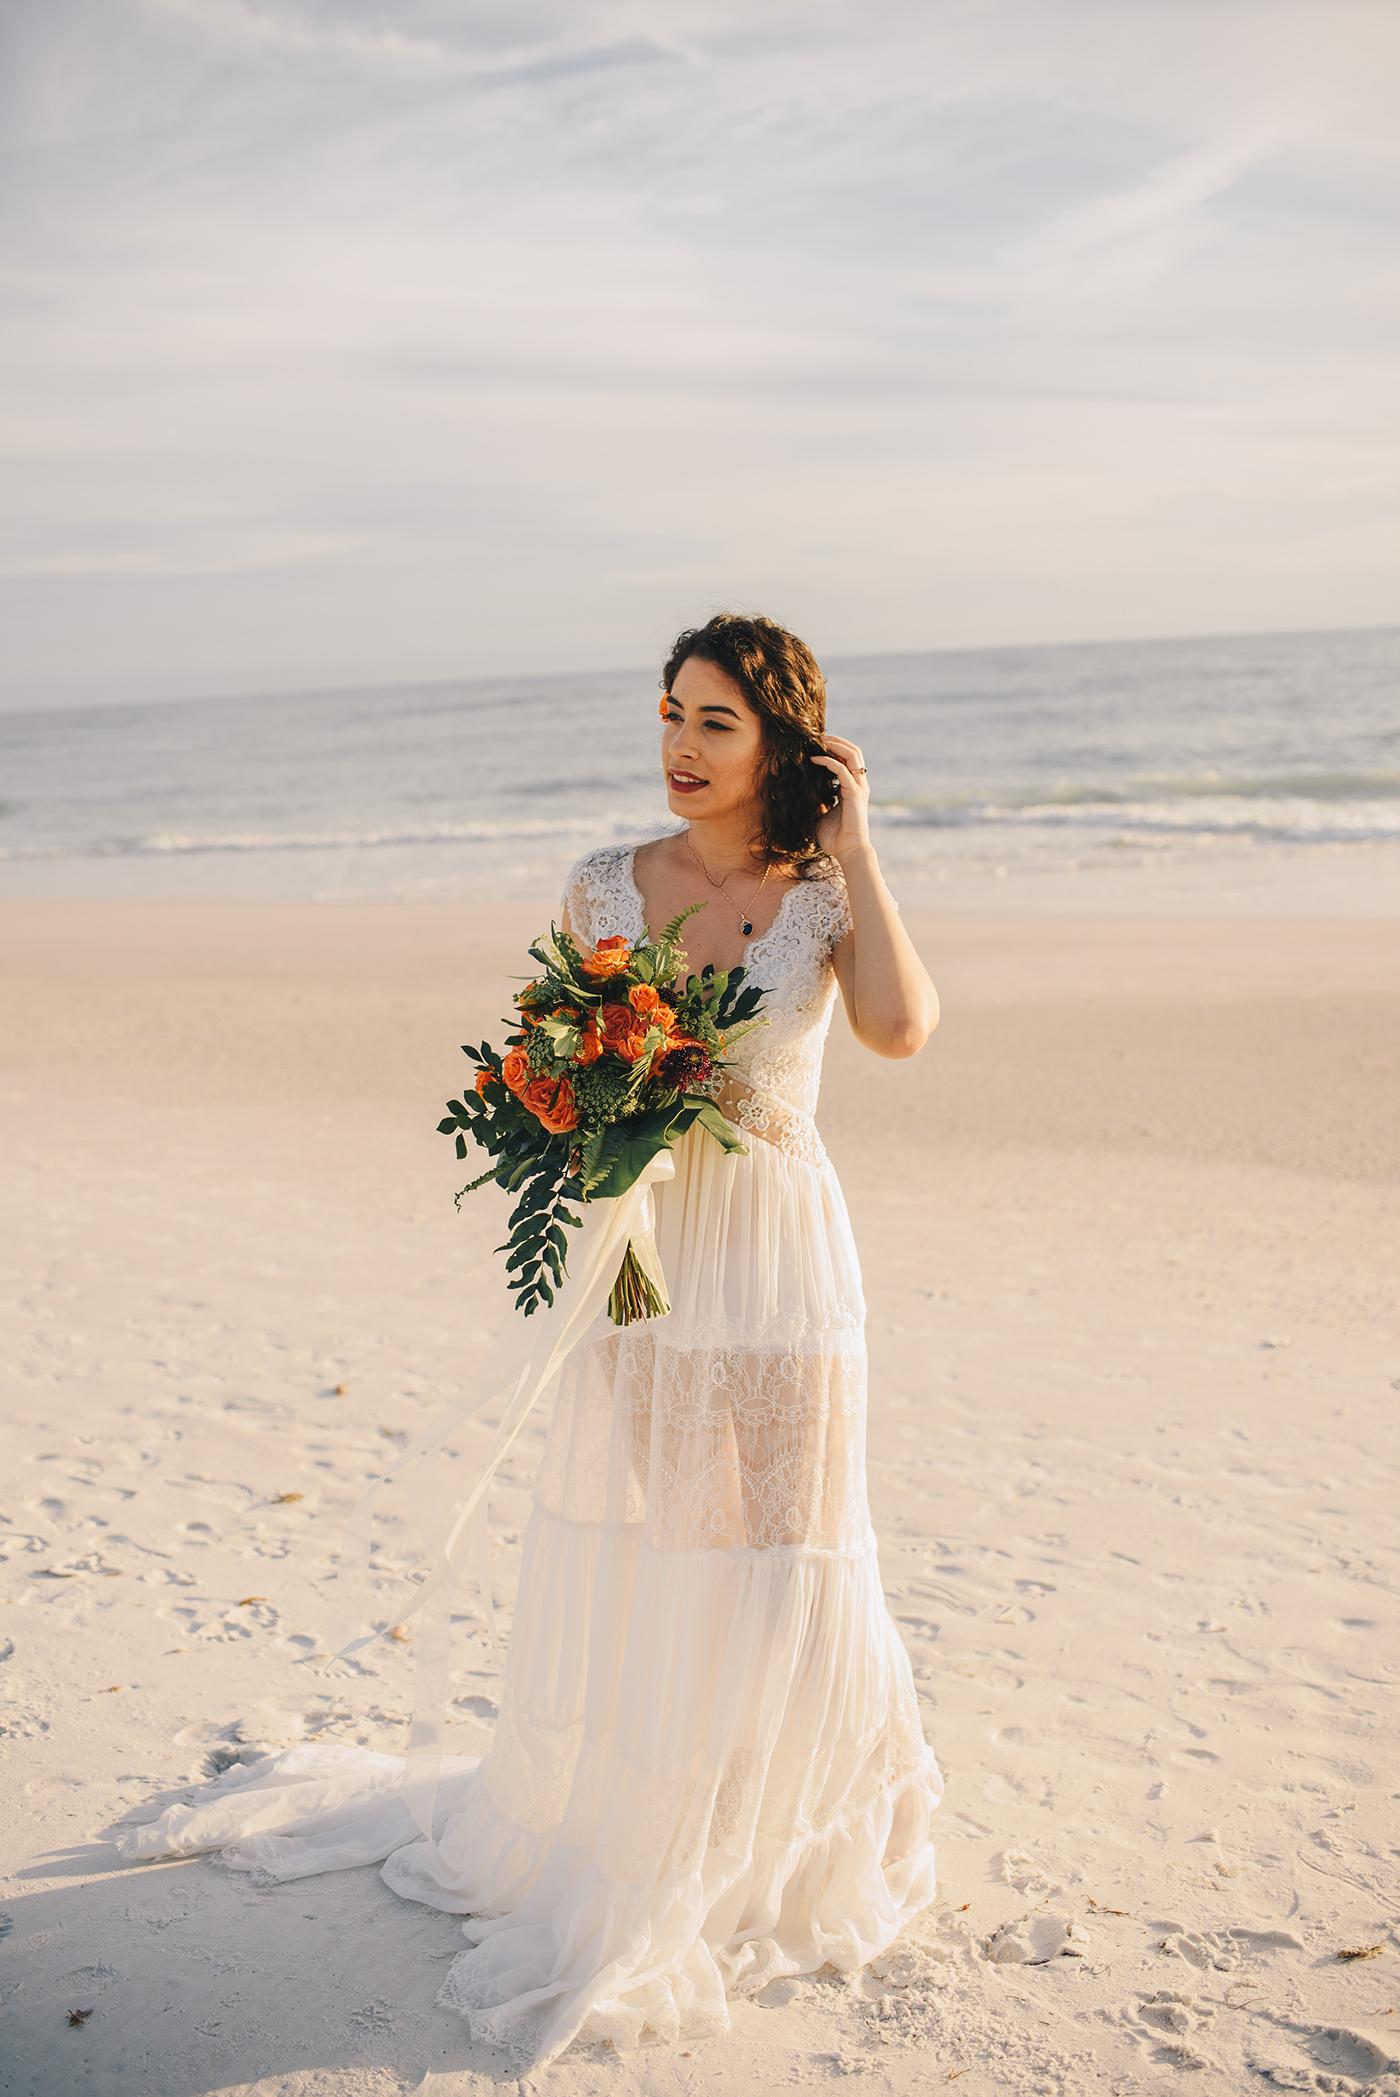 Los-Vargas-Photo-Moana-Wedding-Style-shoot-60.jpg